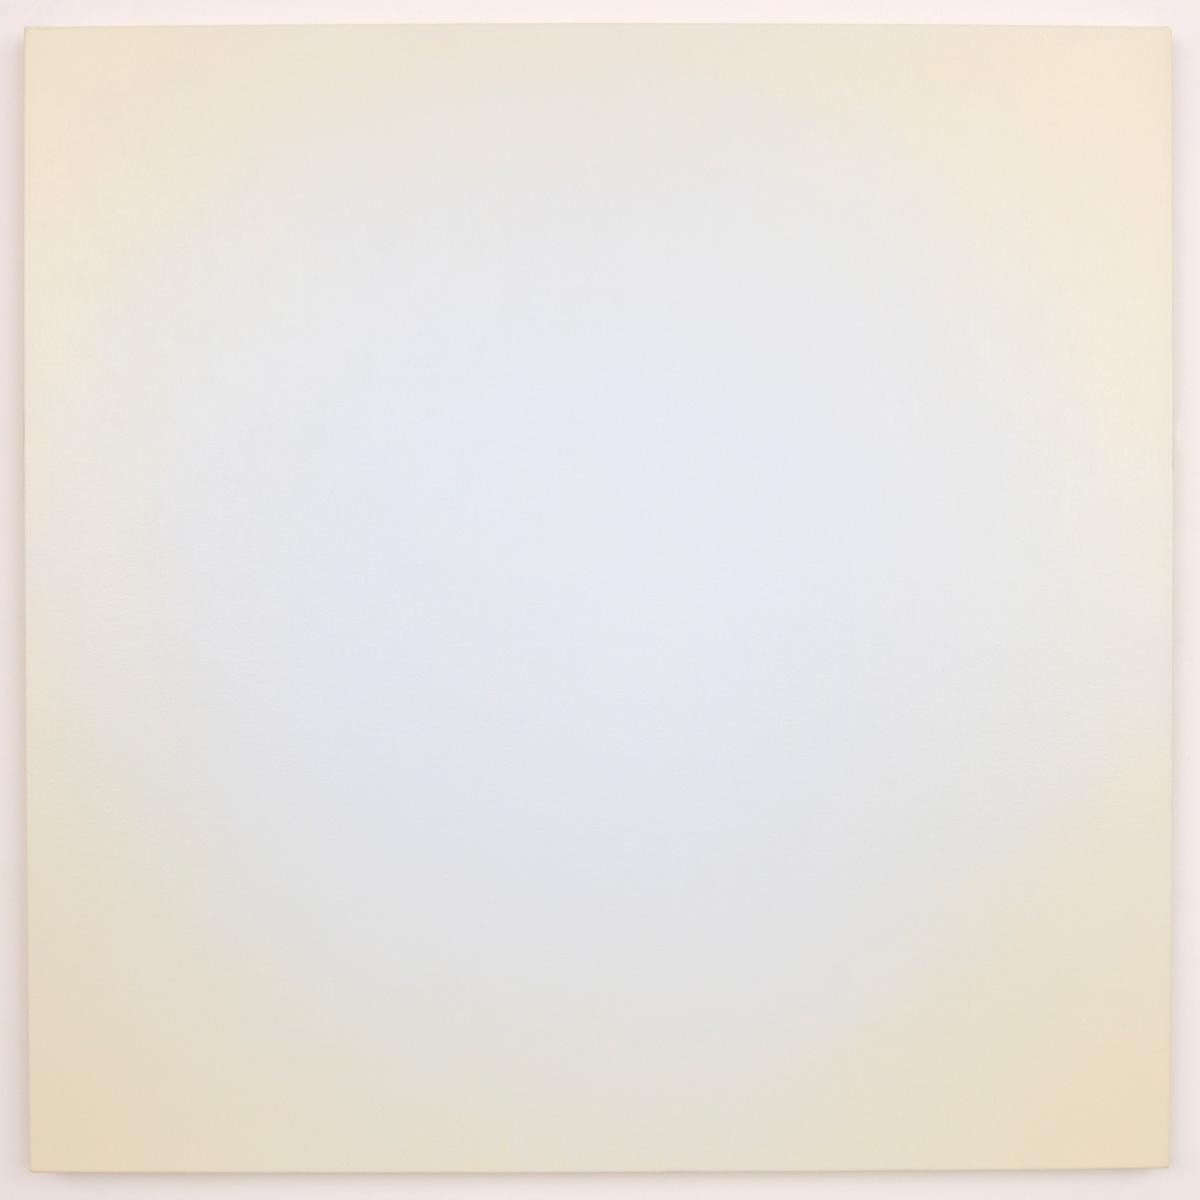 Blue Orange #11 (White/Yellow-Orange), Equivalence Blue Orange Series, 2006, oil on canvas, 30 x 30 in. (76 x 76 cm.)